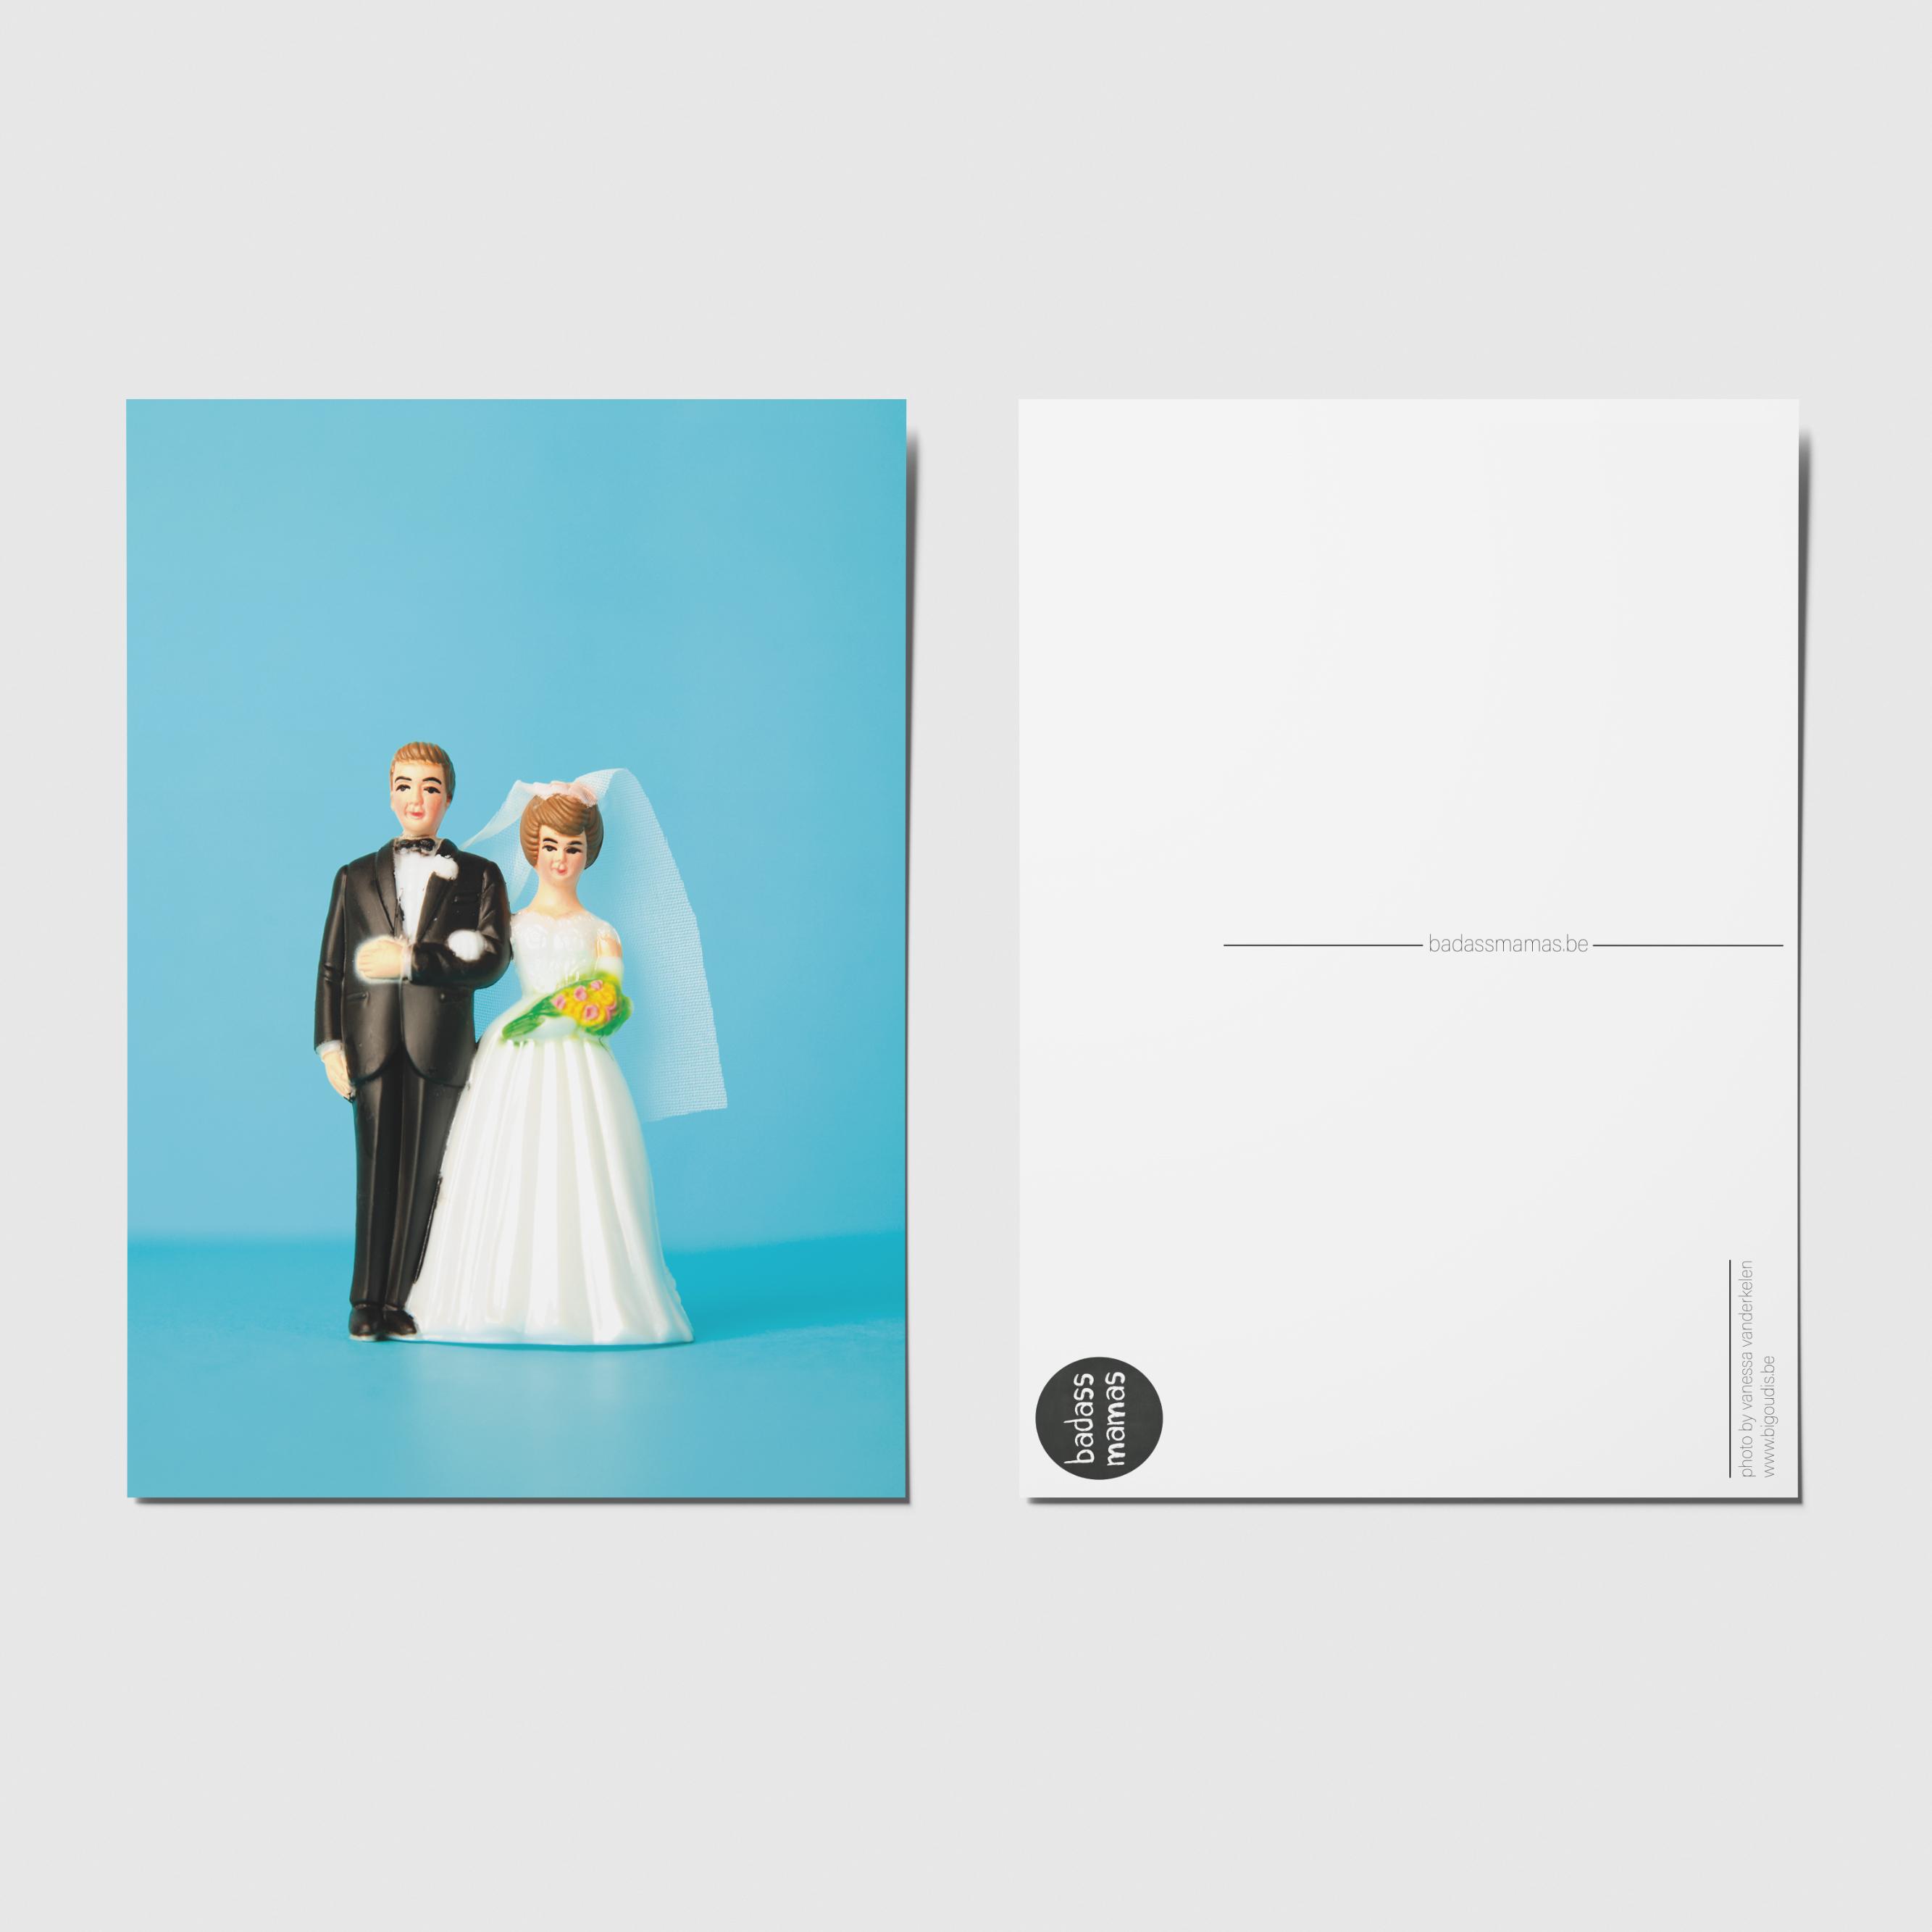 carte postale mariage #02